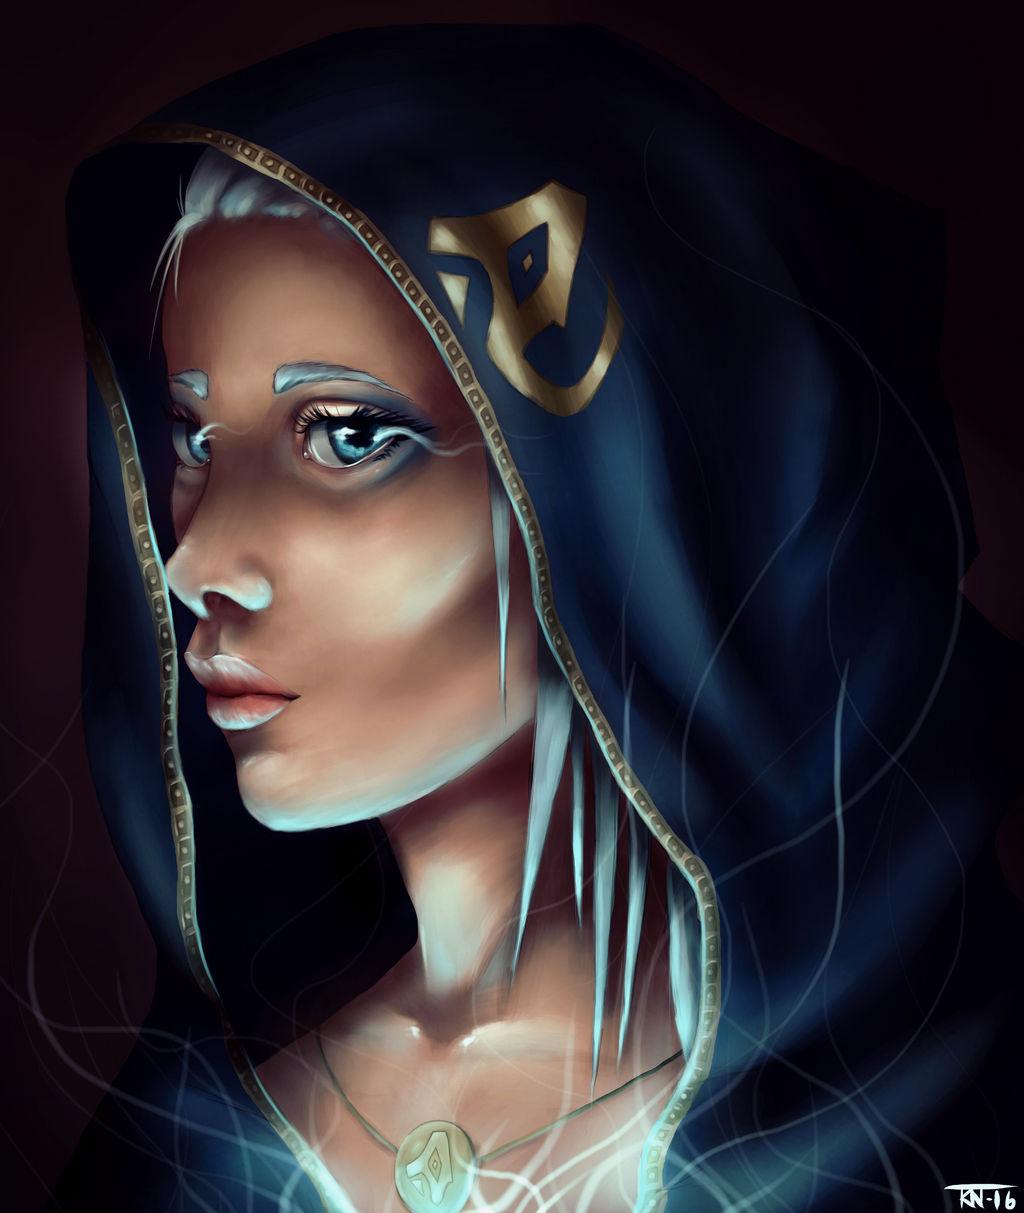 Sorcerer by trinemusen1